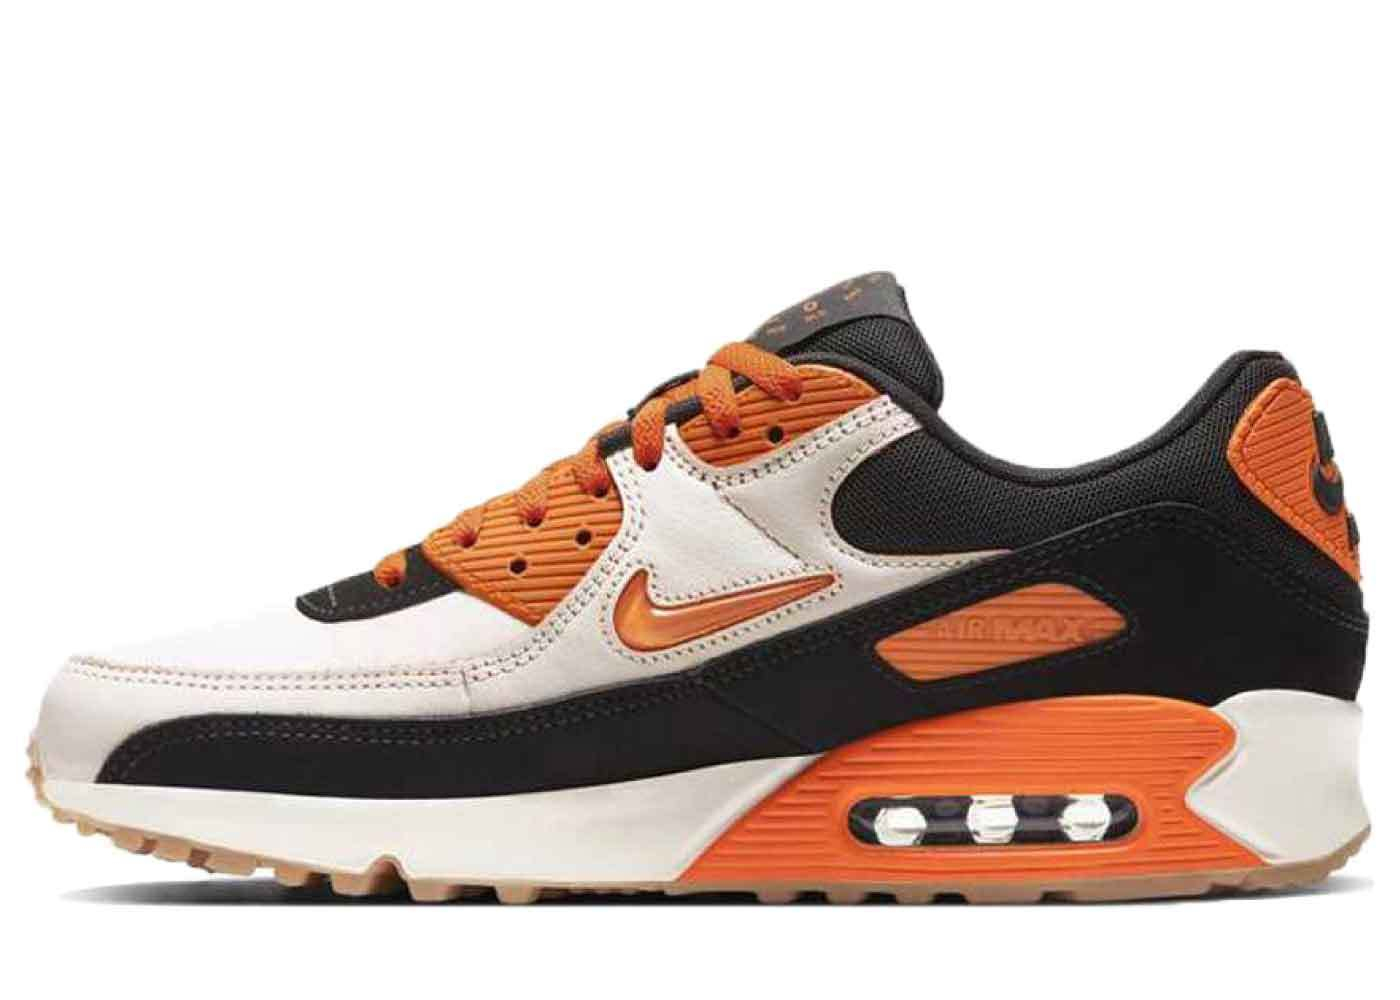 Nike Air Max 90 Home & Away Orangeの写真